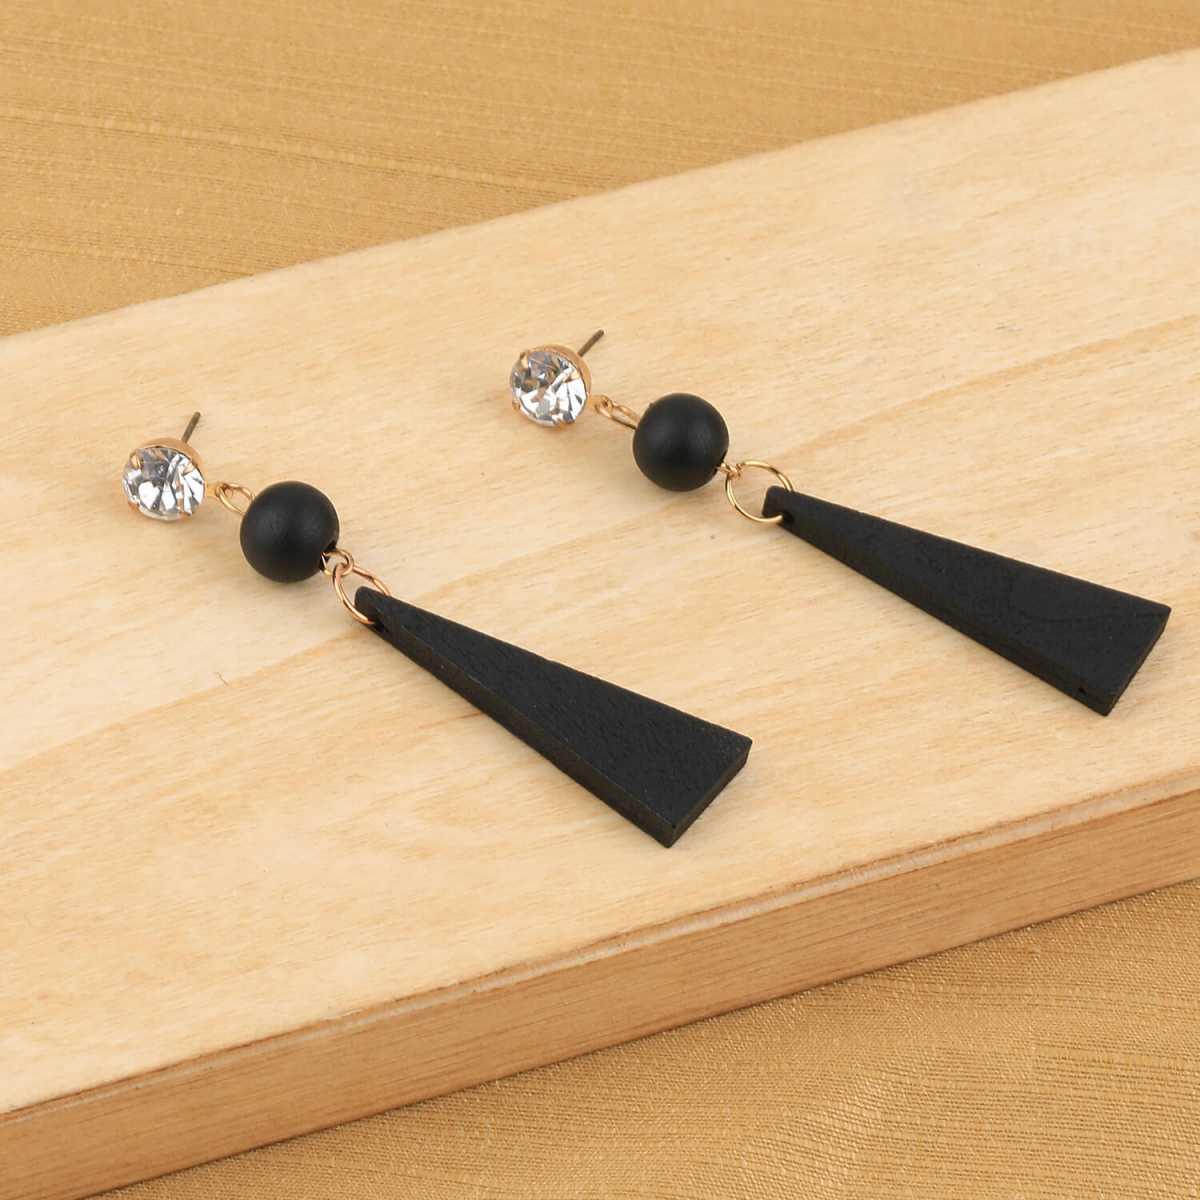 SILVER SHINE Exclusive Diamond Black Wooden Earrings Long Dangler Light Weight for Girls and Women.